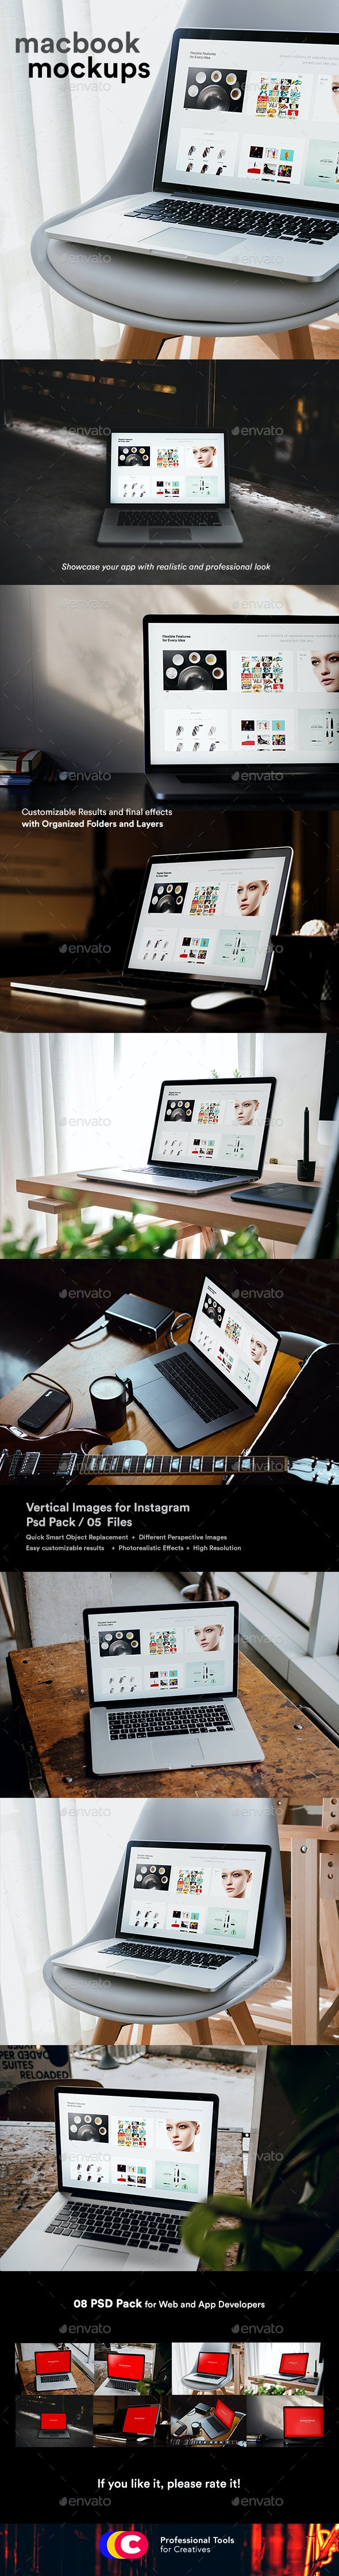 Laptop Pro Mock-Up Psd - Minimal Workstation - Laptop Displays